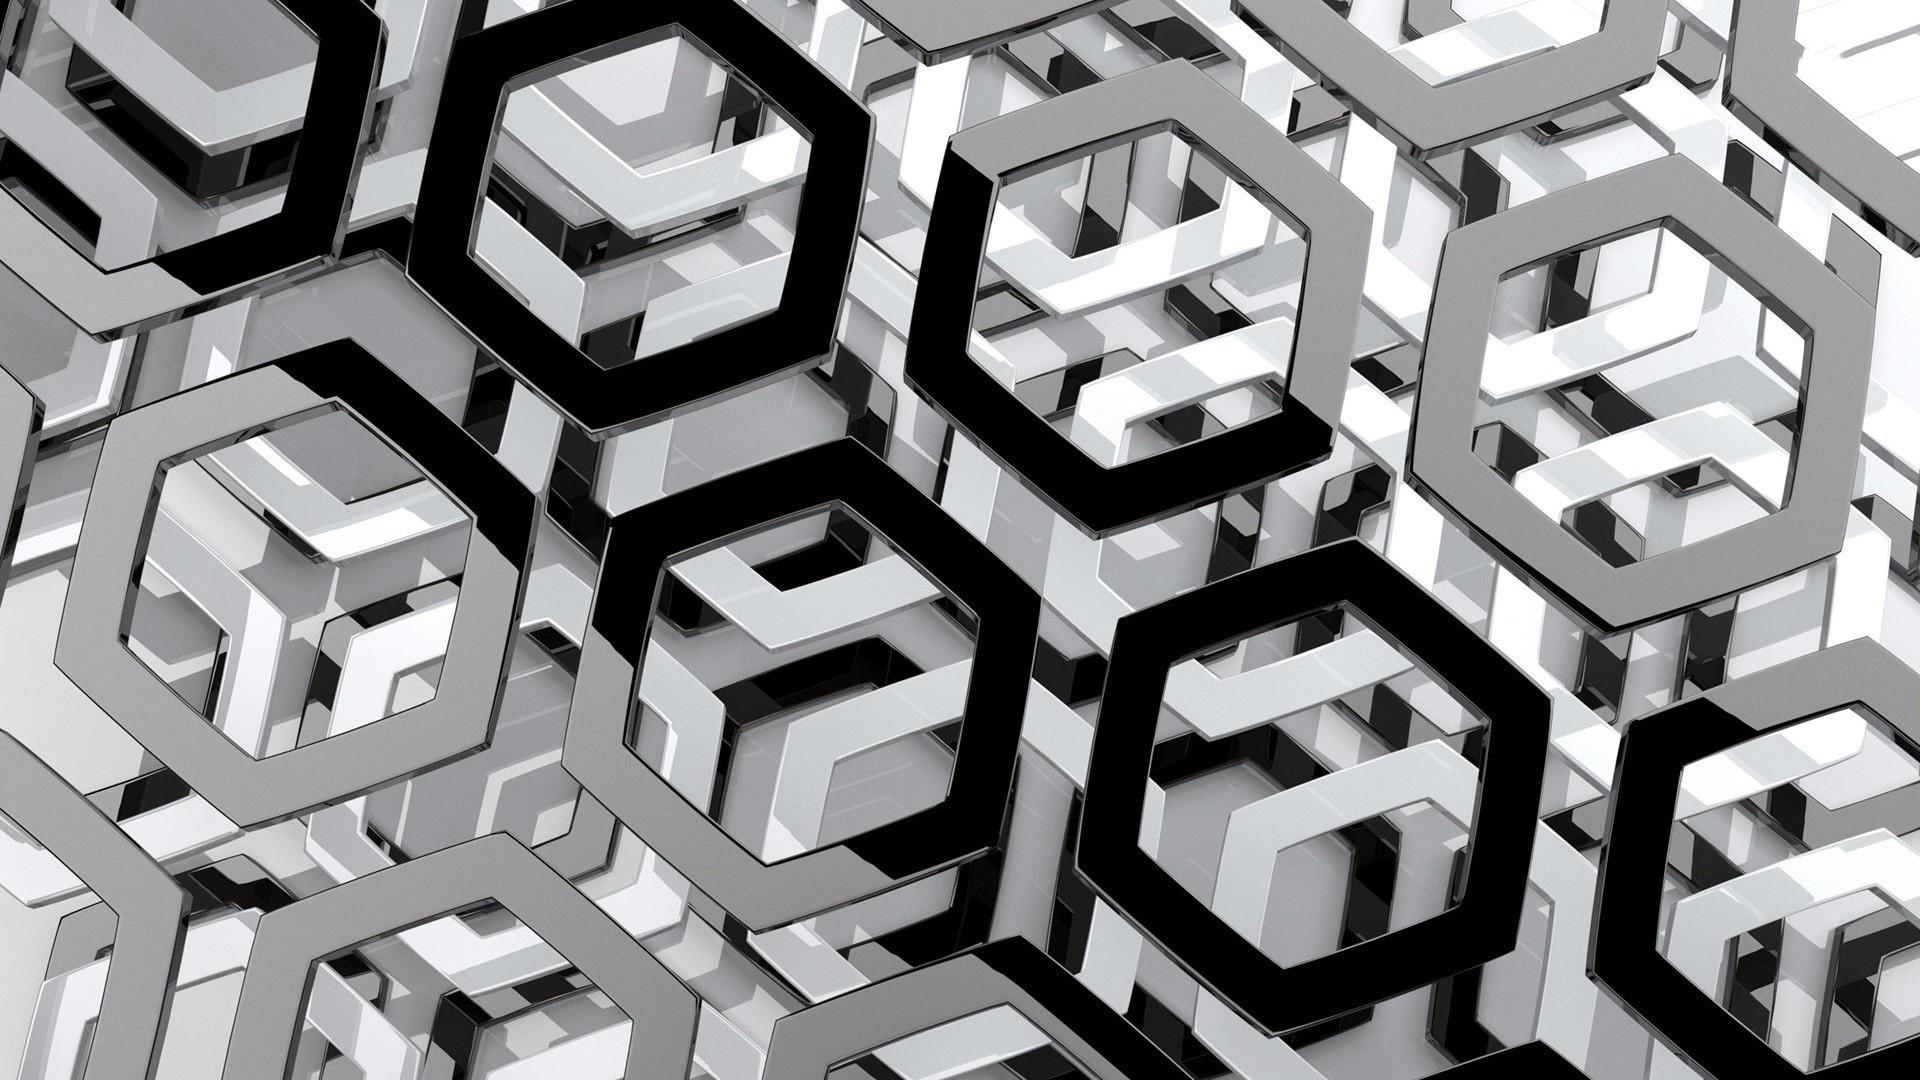 General 1920x1080 abstract hexagon render monochrome